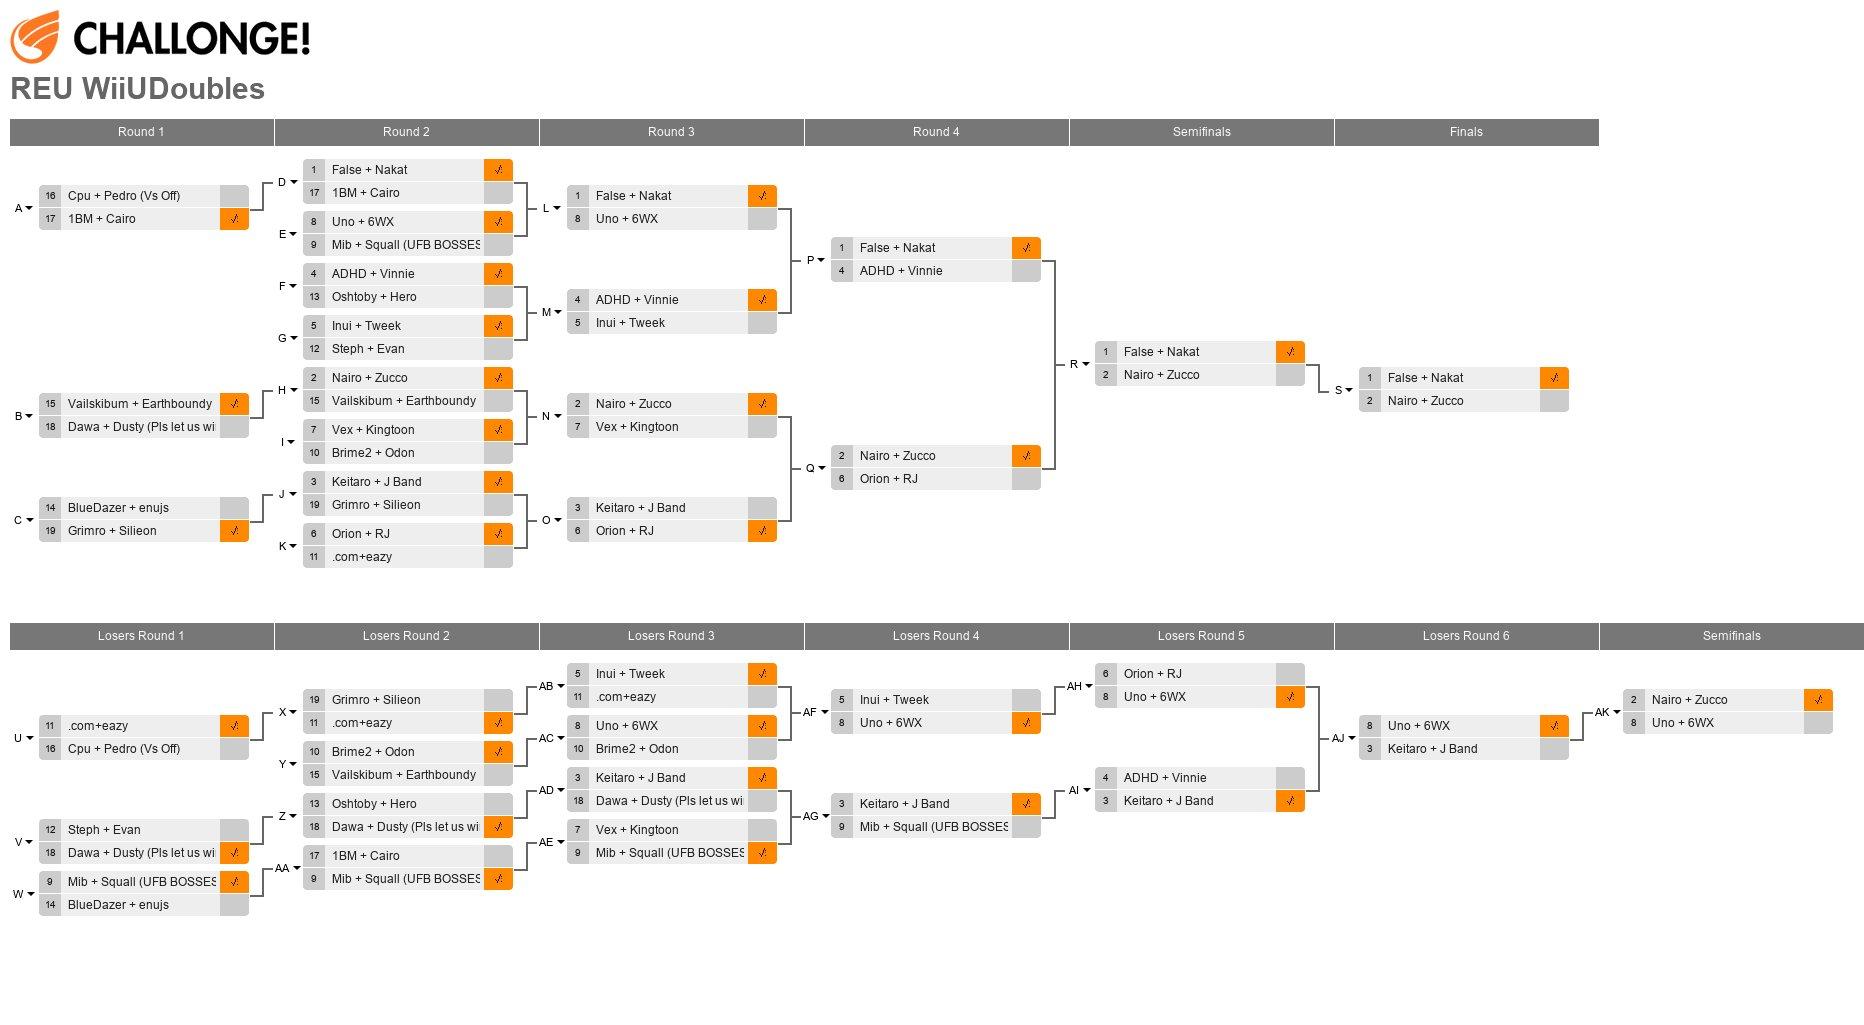 Roll Em Up Smash 4 Doubles (19 teams)